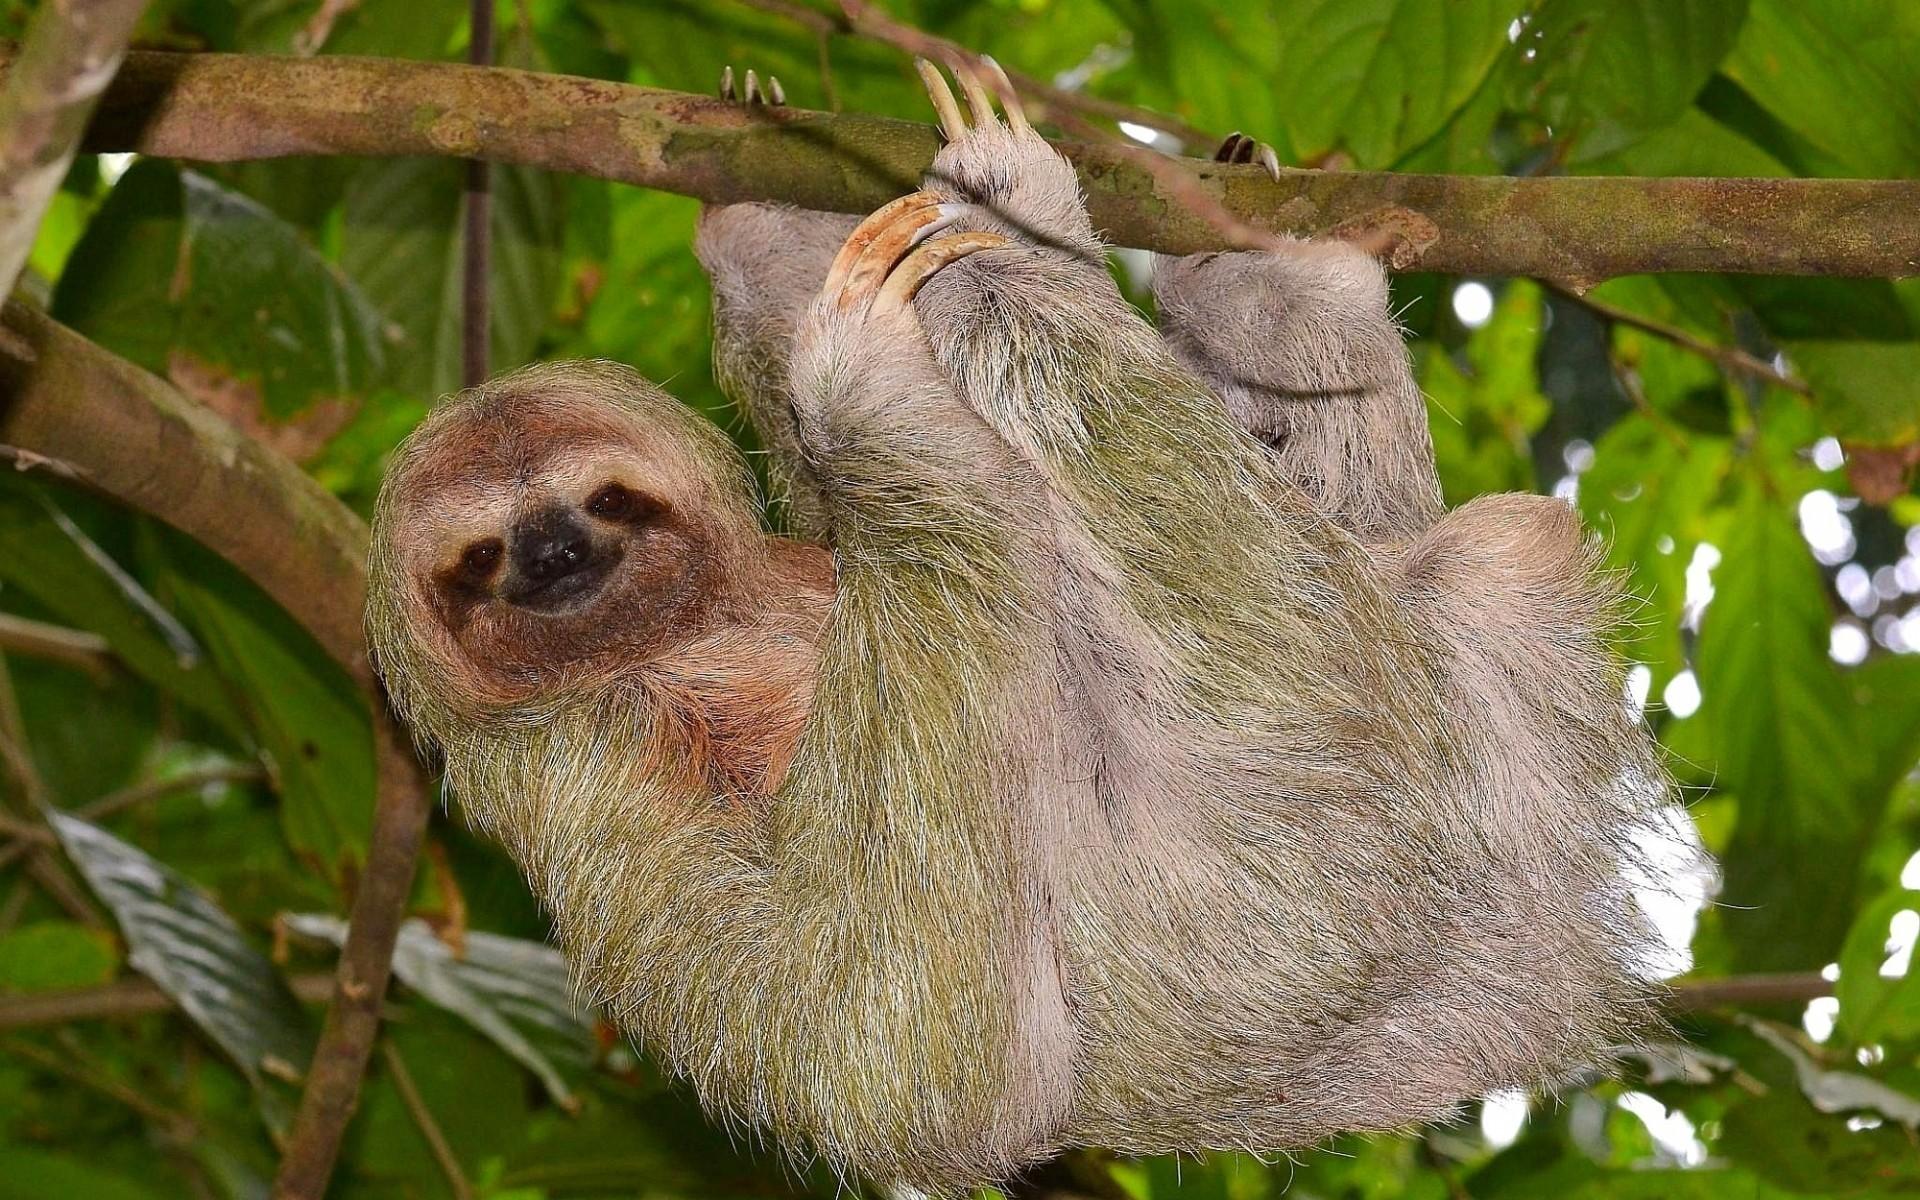 … animals hanging sloth wallpaper …